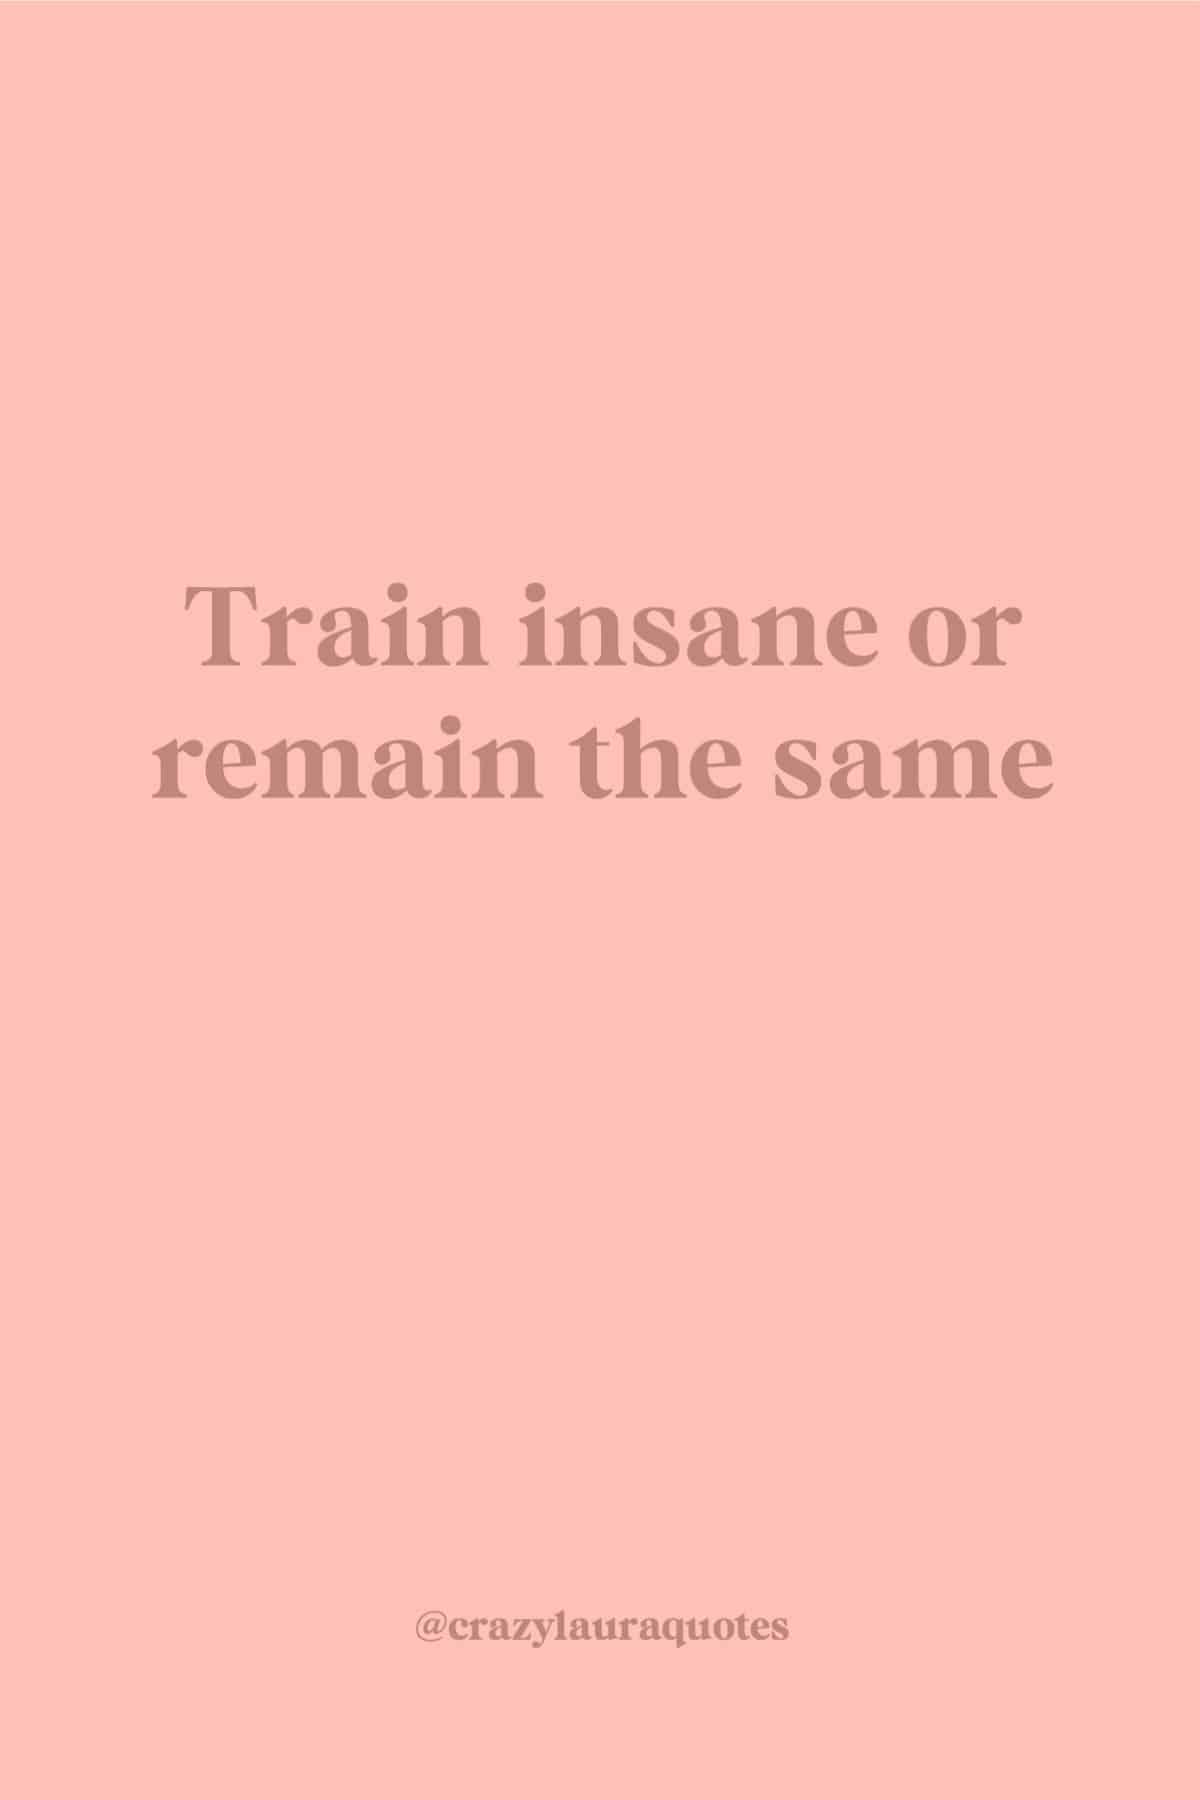 motivational training quote